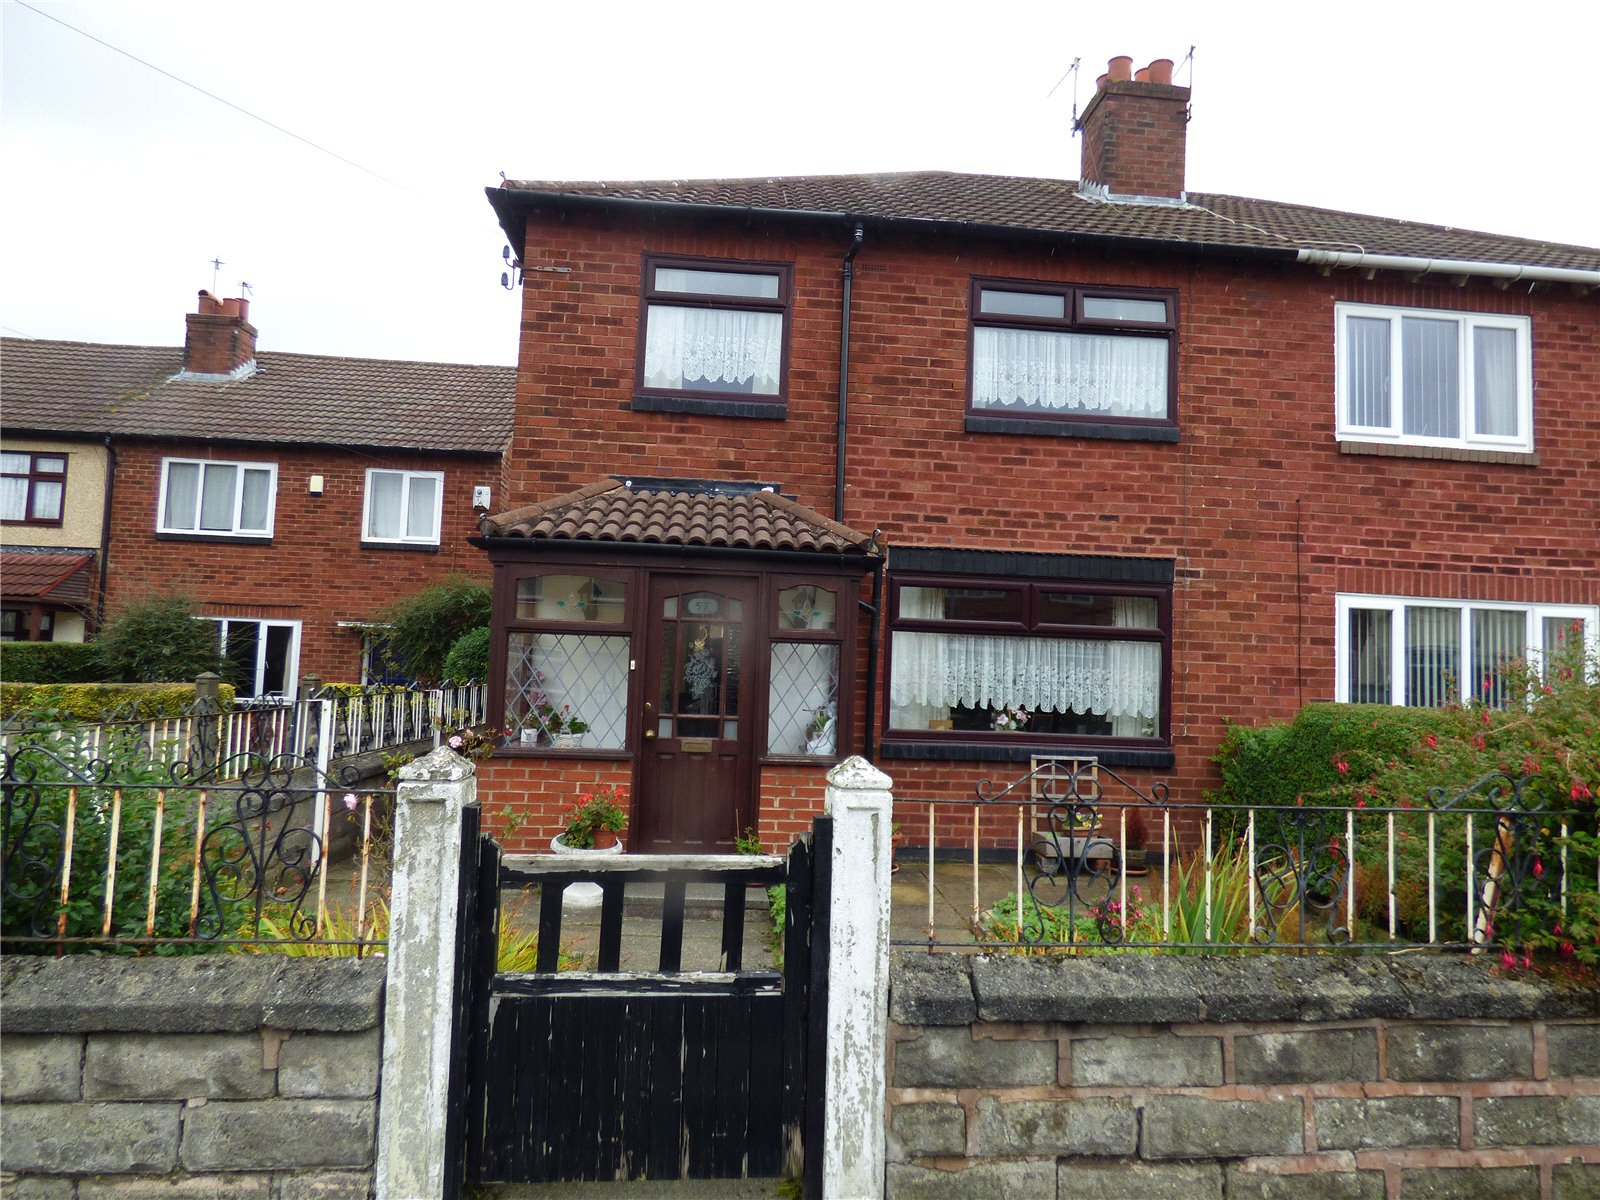 3 Bedrooms Semi Detached House for sale in Westfield Avenue, Liverpool, Merseyside, L14